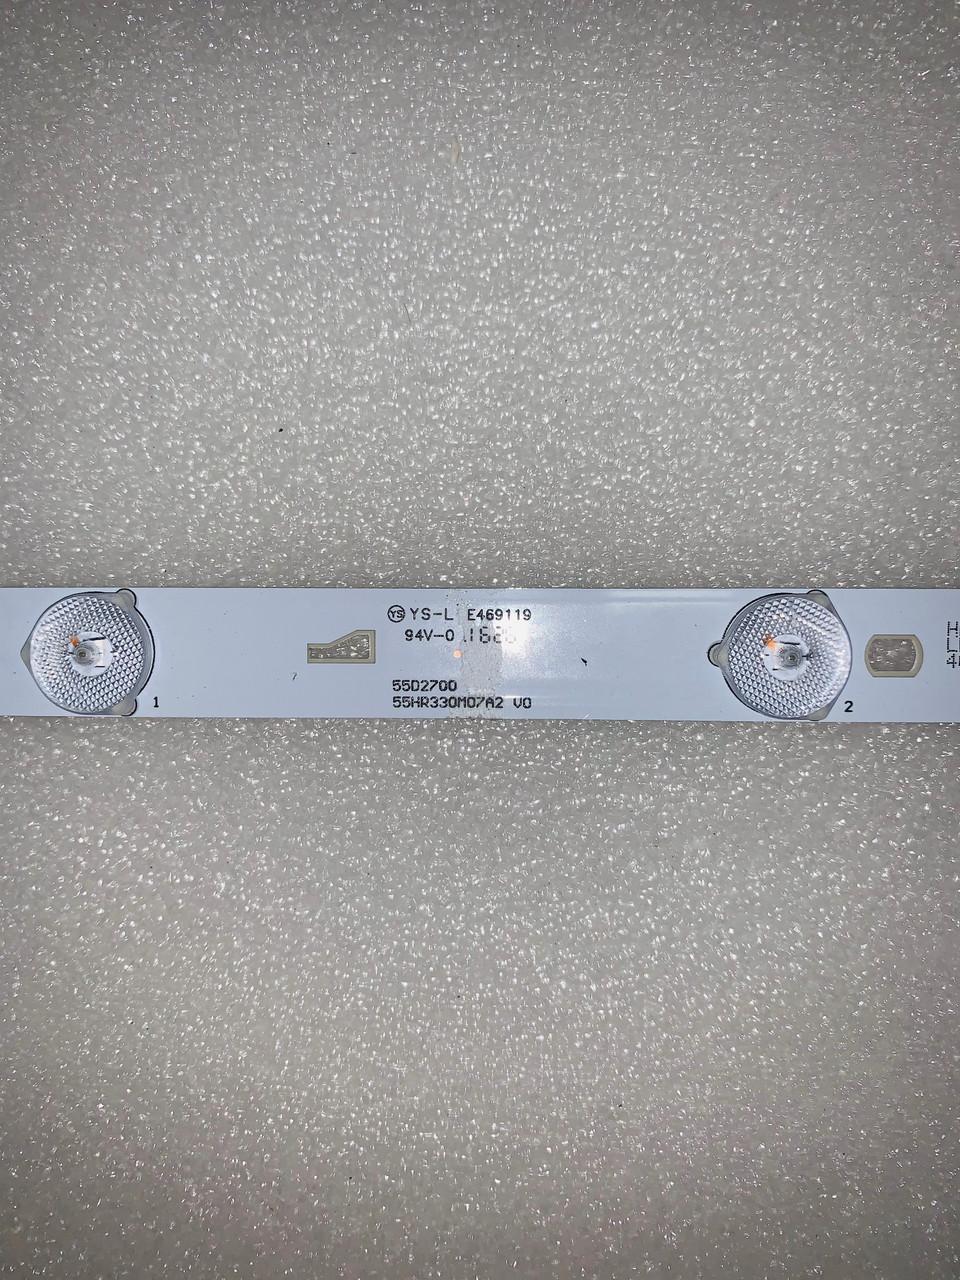 TCL 55US57 LED Light Strips set of 8 55D2700 / 55HR330M07A2